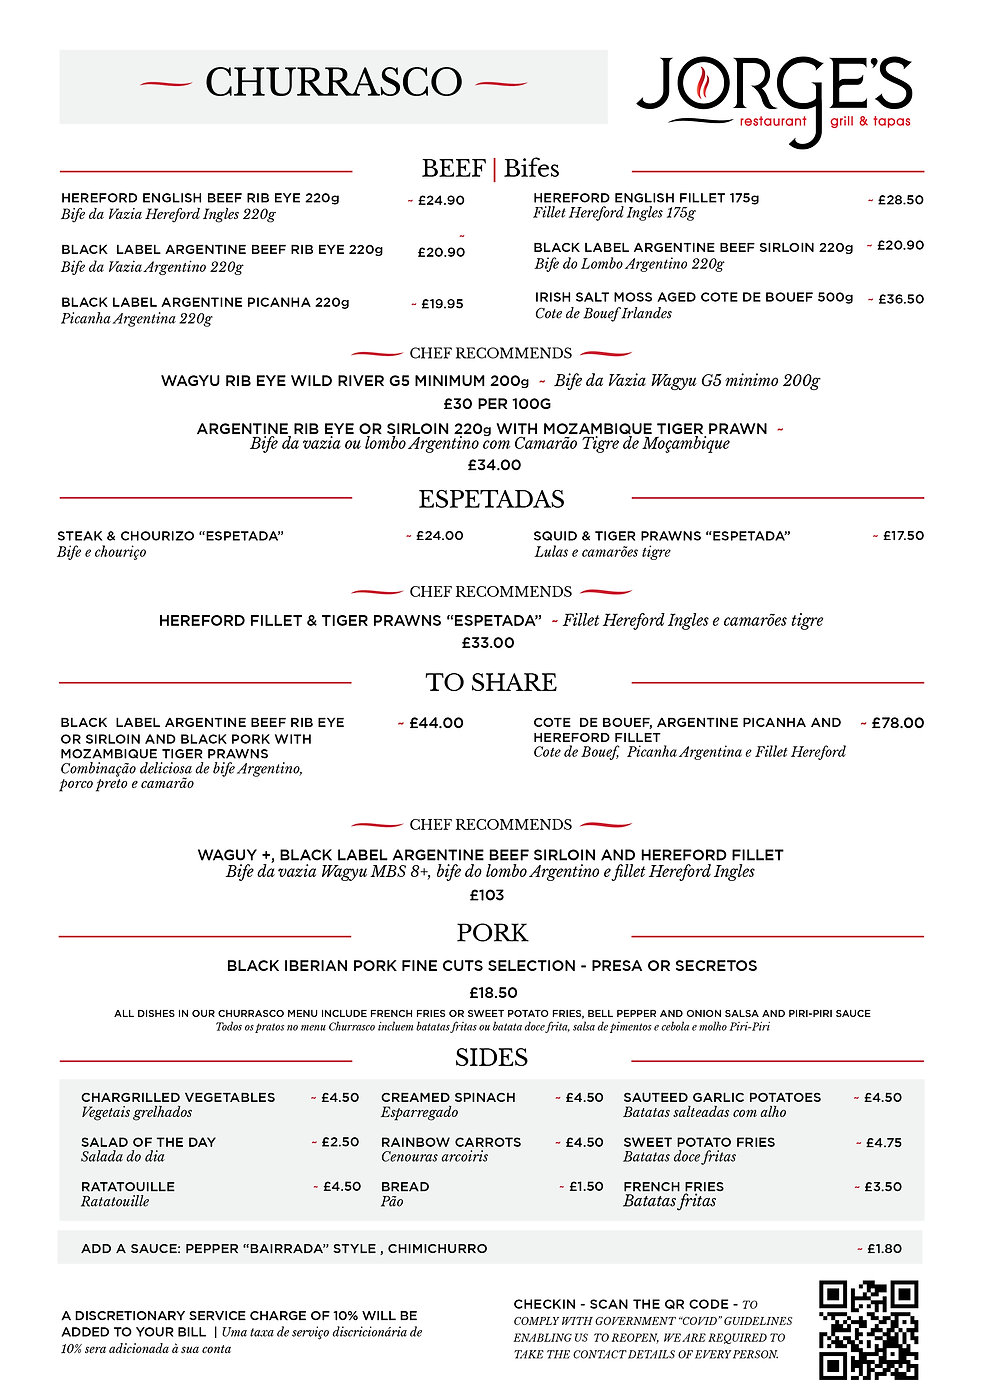 Jorges Restaurant Dinner Menu October 2021.jpg